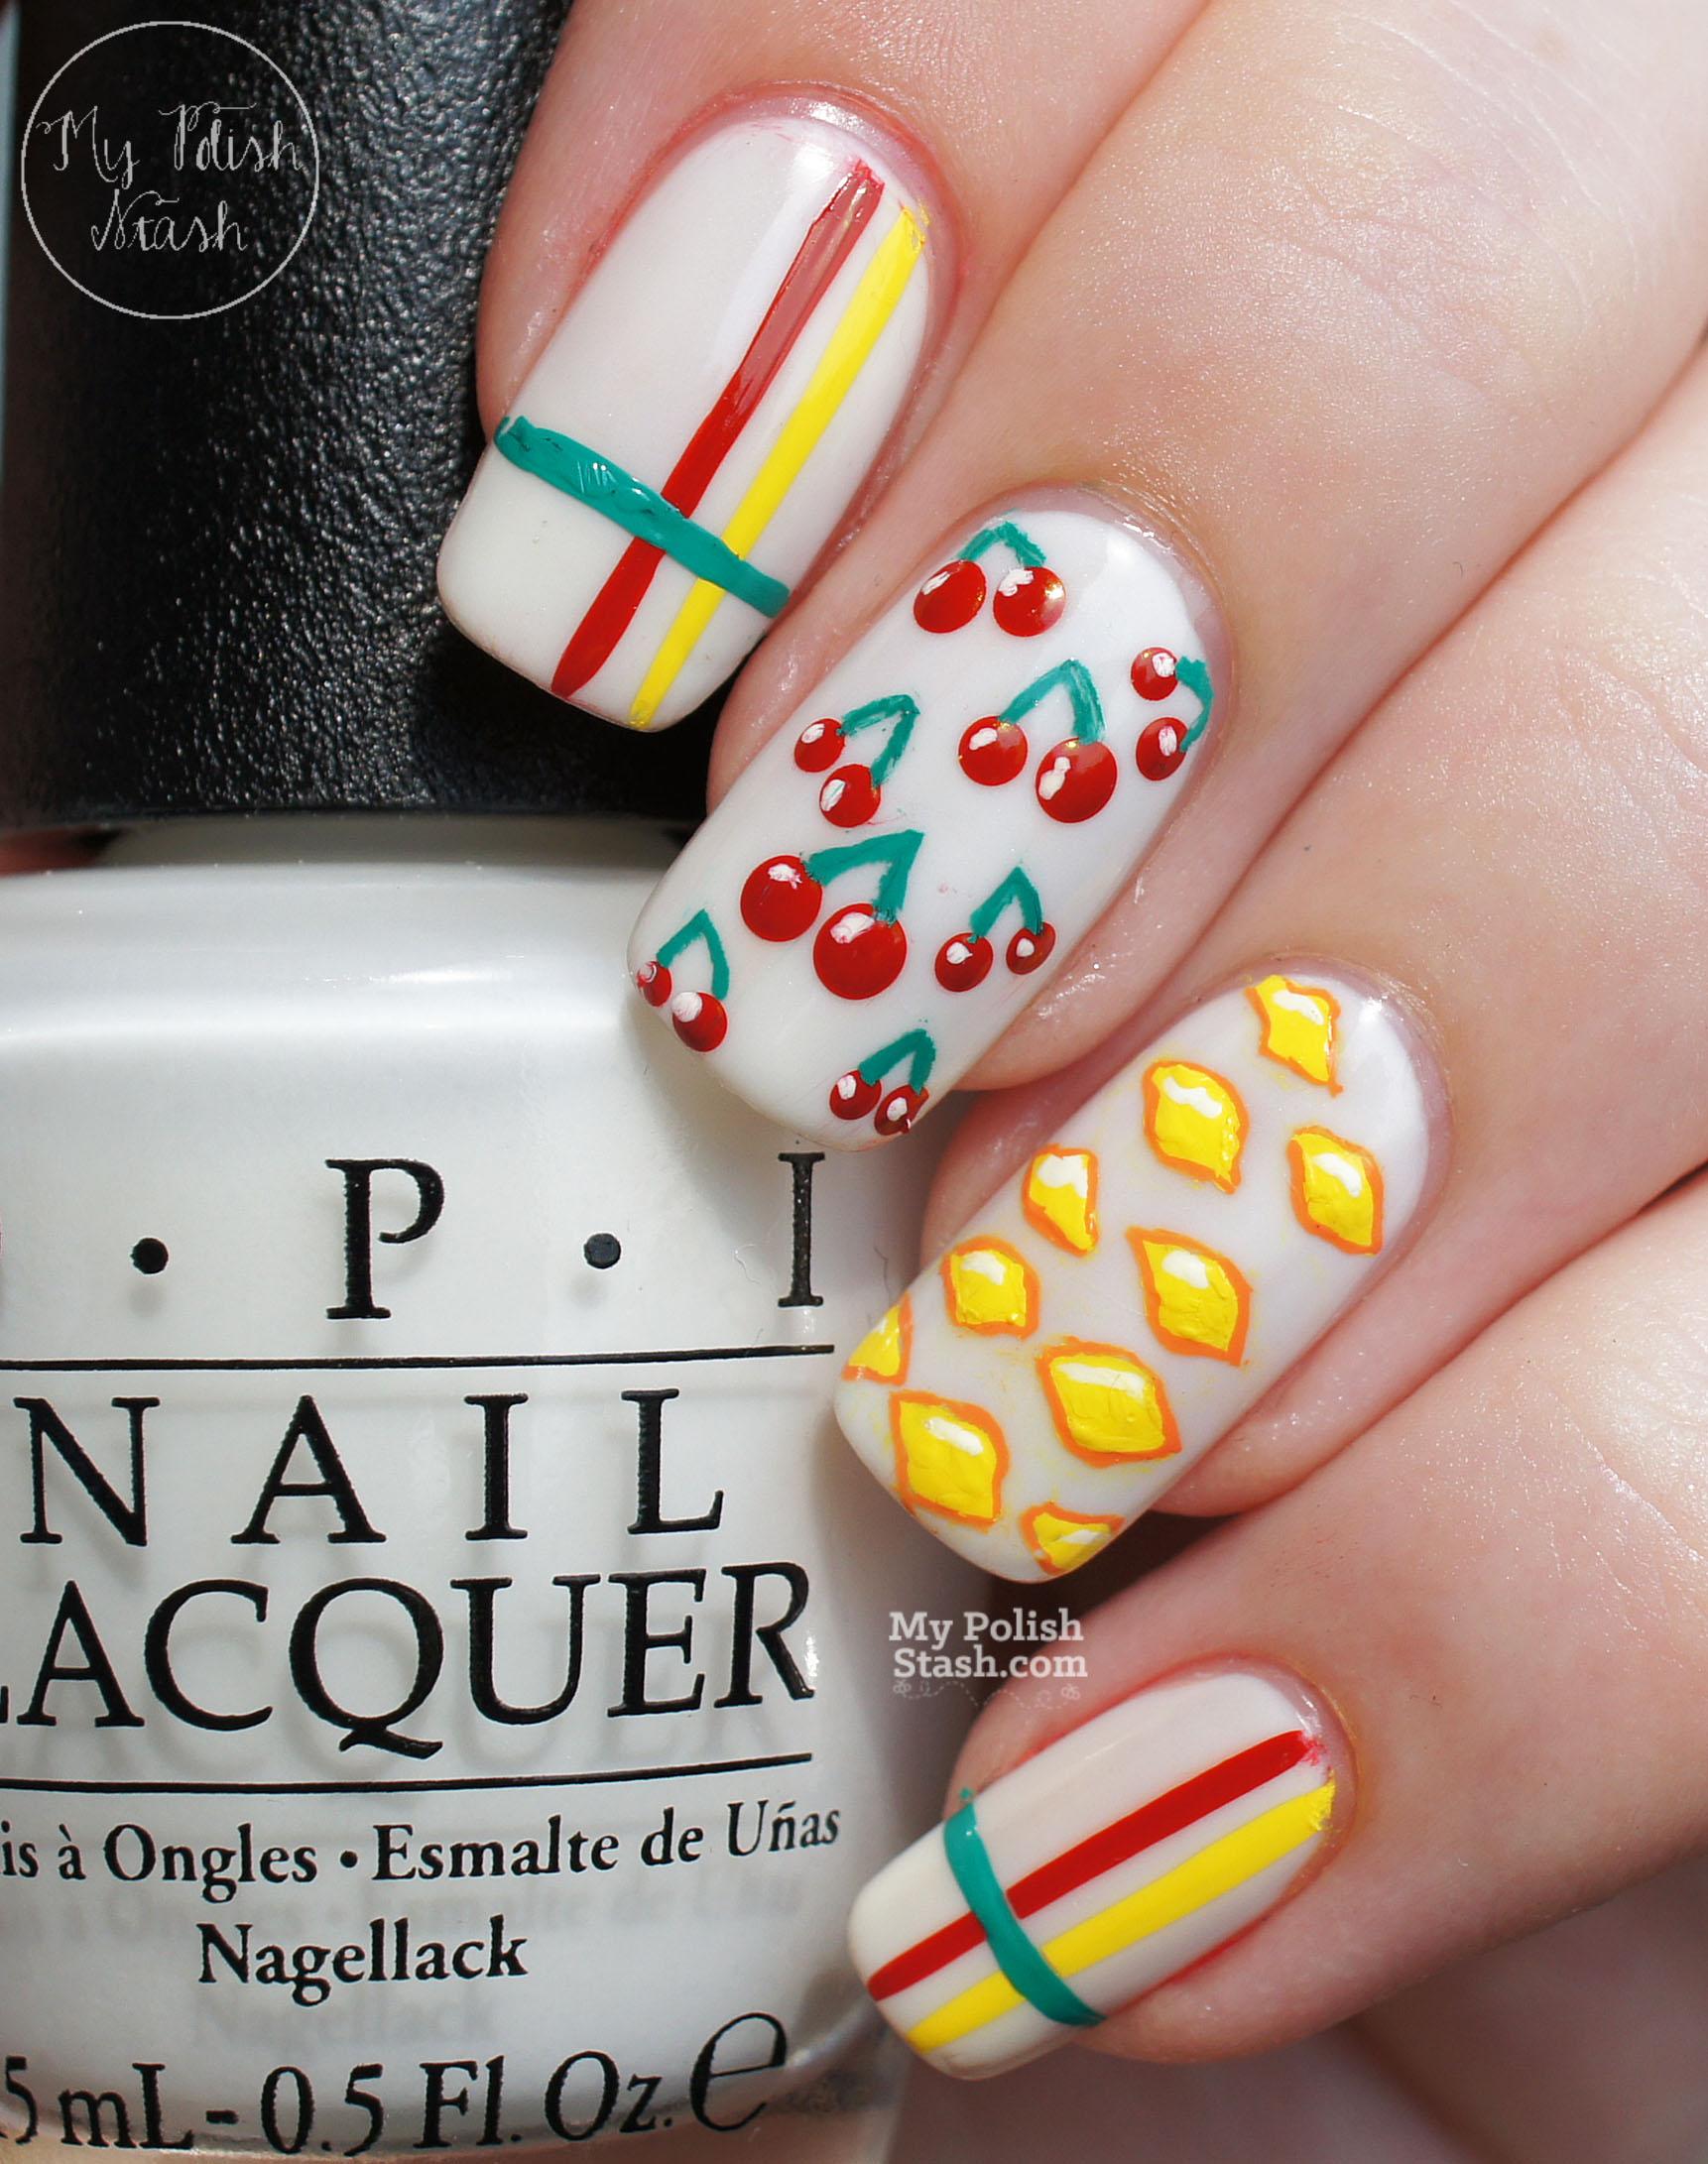 cherries-and-lemons-nails-3